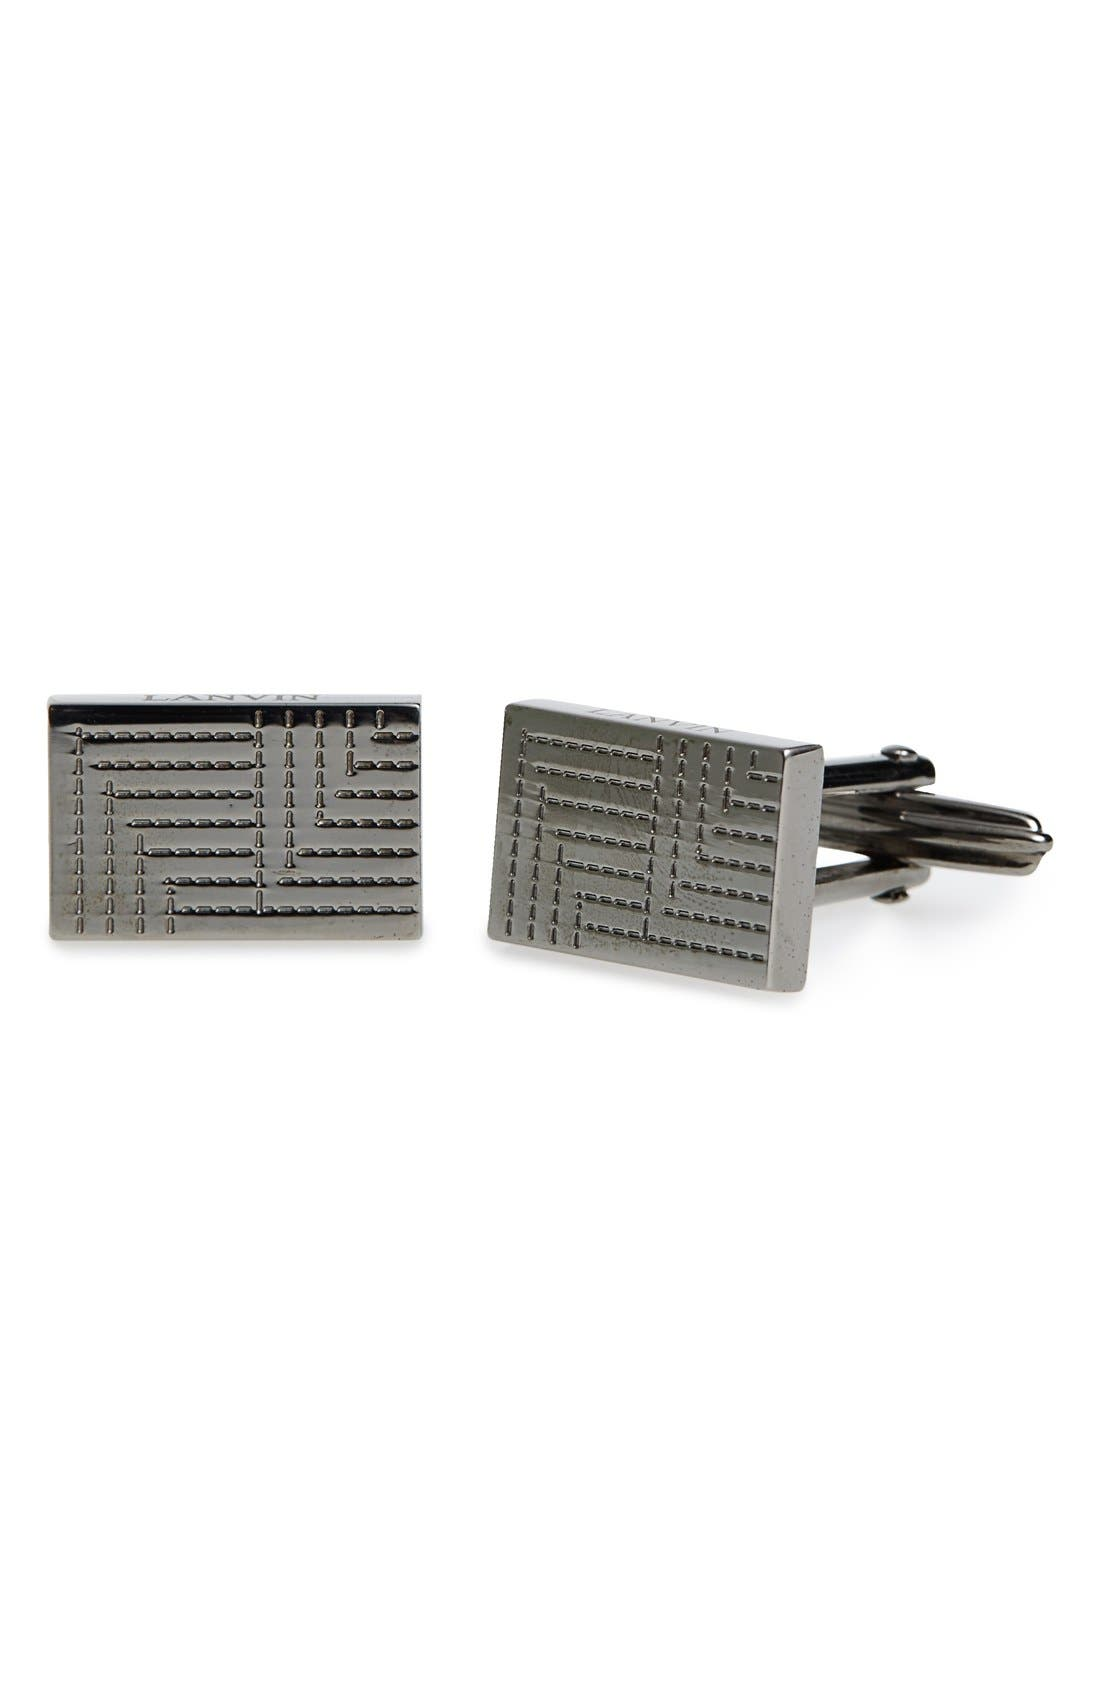 Textured Metal Plaque Rectangular Cuff Links,                             Main thumbnail 1, color,                             040